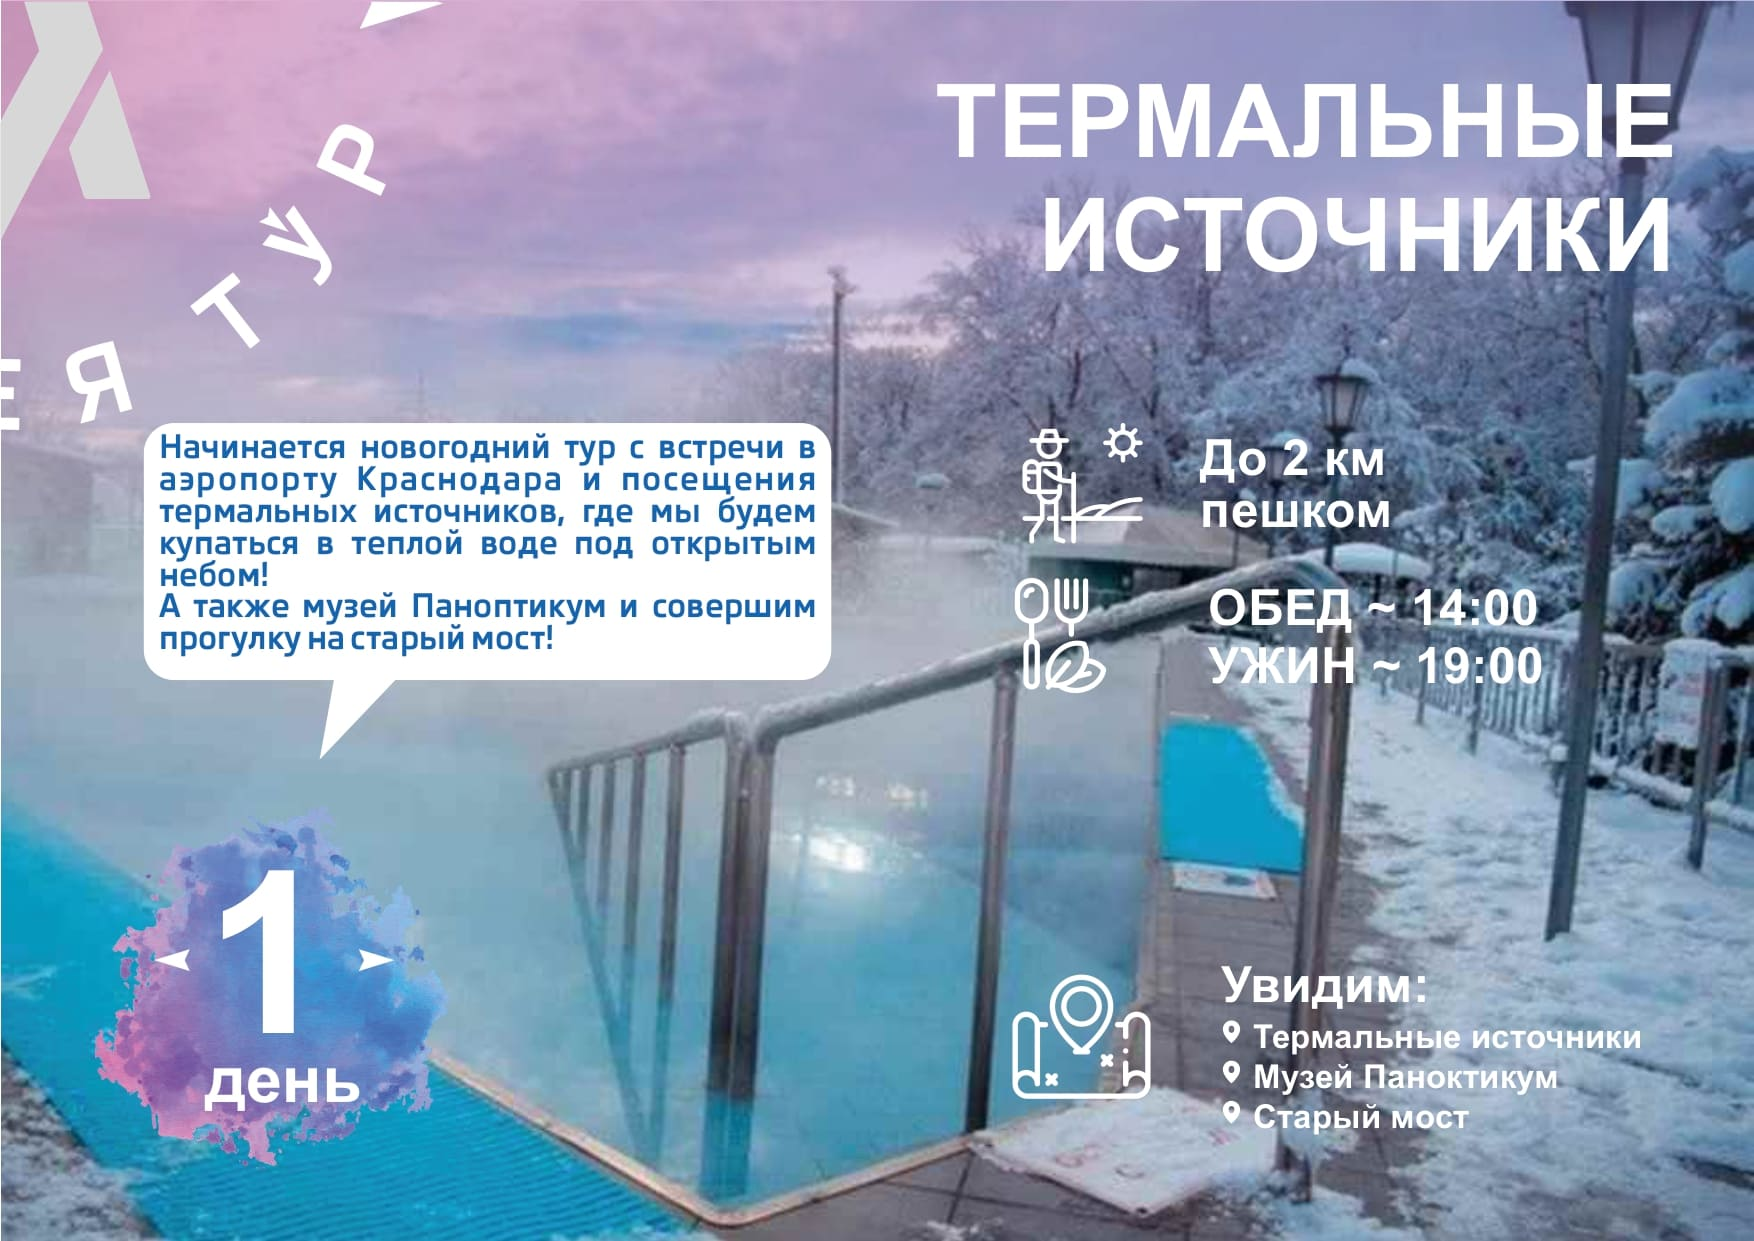 Новогодний Адыгея_compressed (1)_page-0005